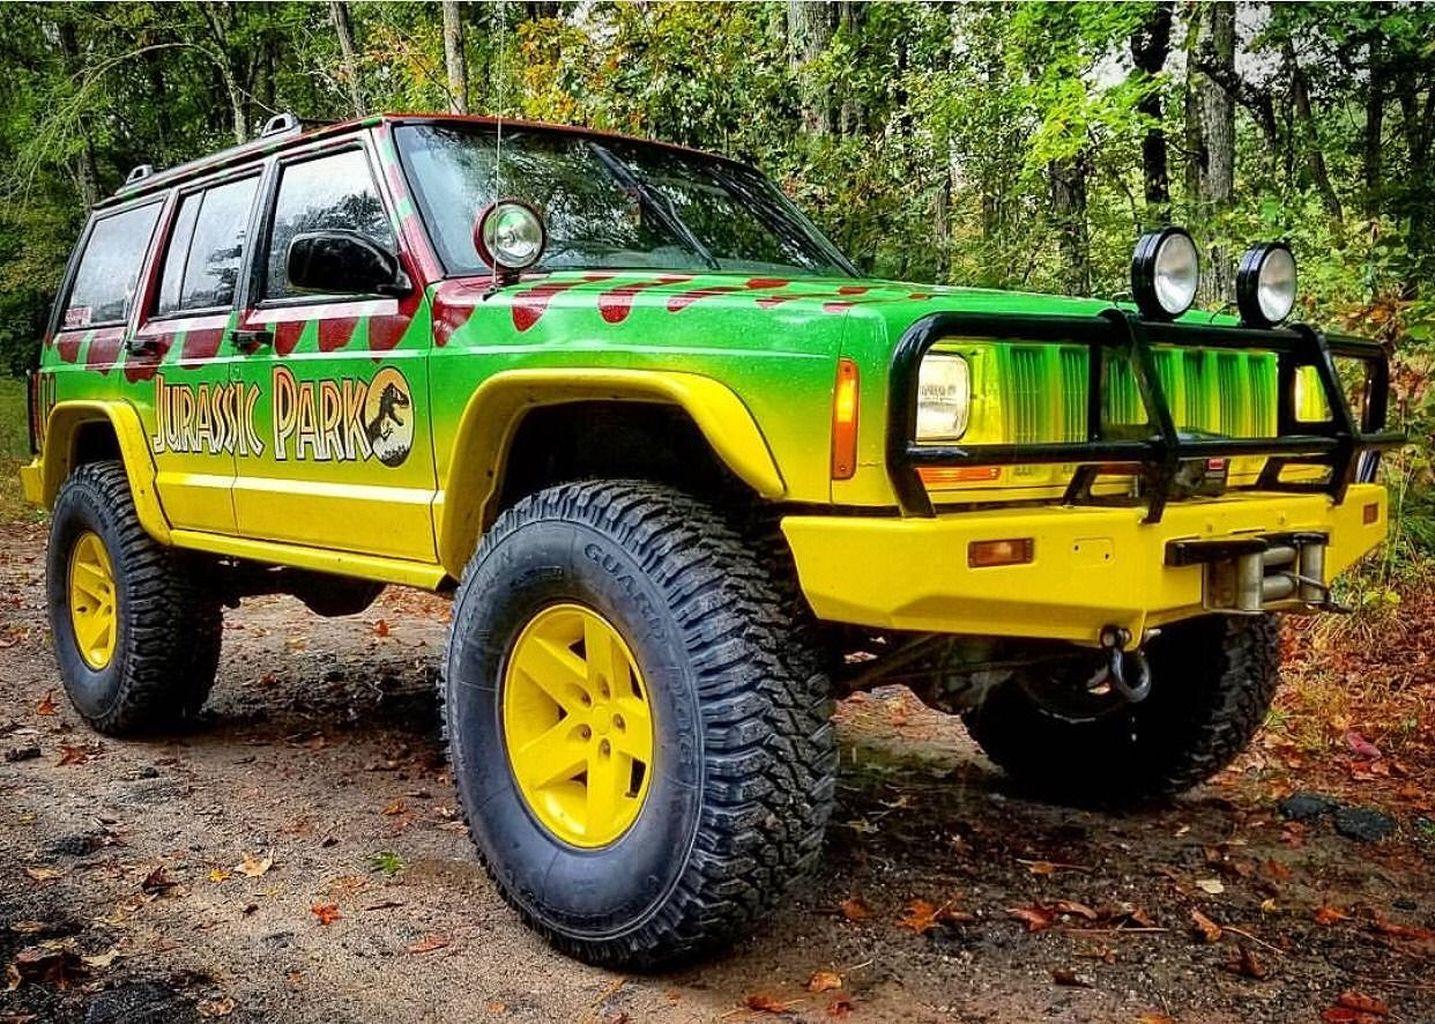 49 Jurassic Park Jeep Wrangler Special Edition Https Www Mobmasker Com 49 Jurassic Park Jeep Wrangler Jurassic Park Jeep Lifted Jeep Cherokee Jeep Wrangler